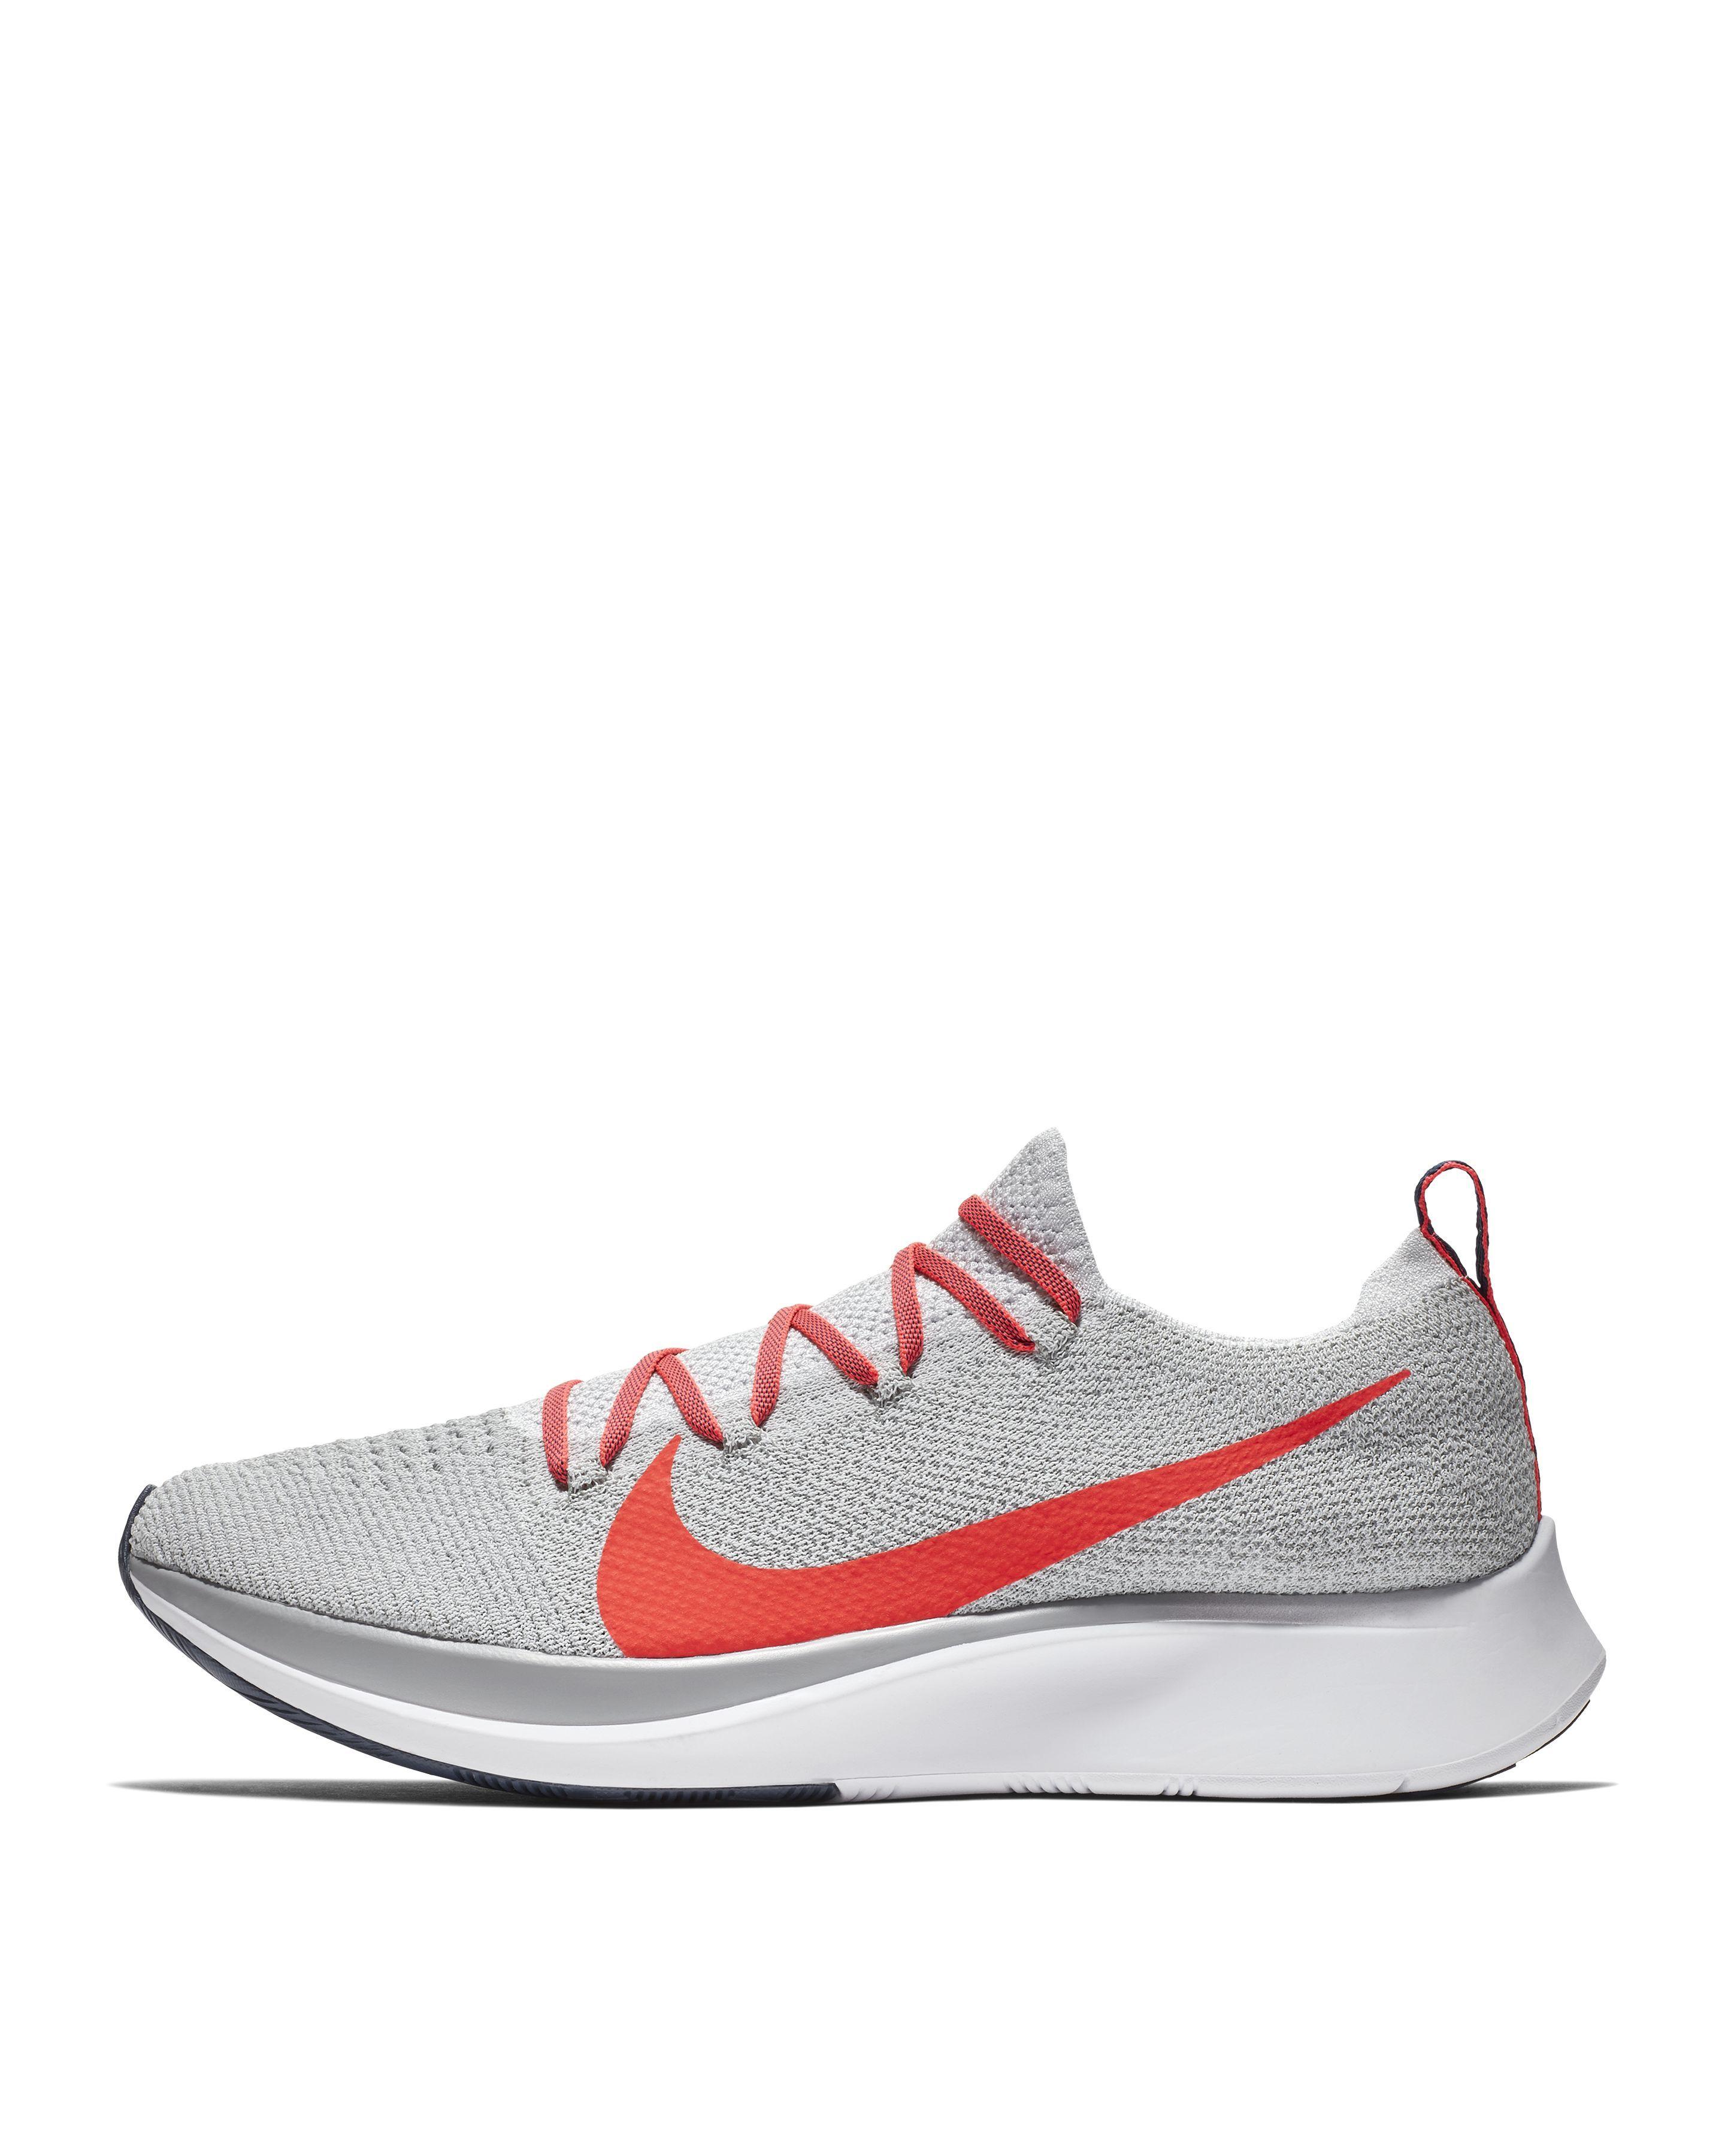 3186b0eb16d Nike Shoe Sale — Deal on Nike Running Shoes April 2019